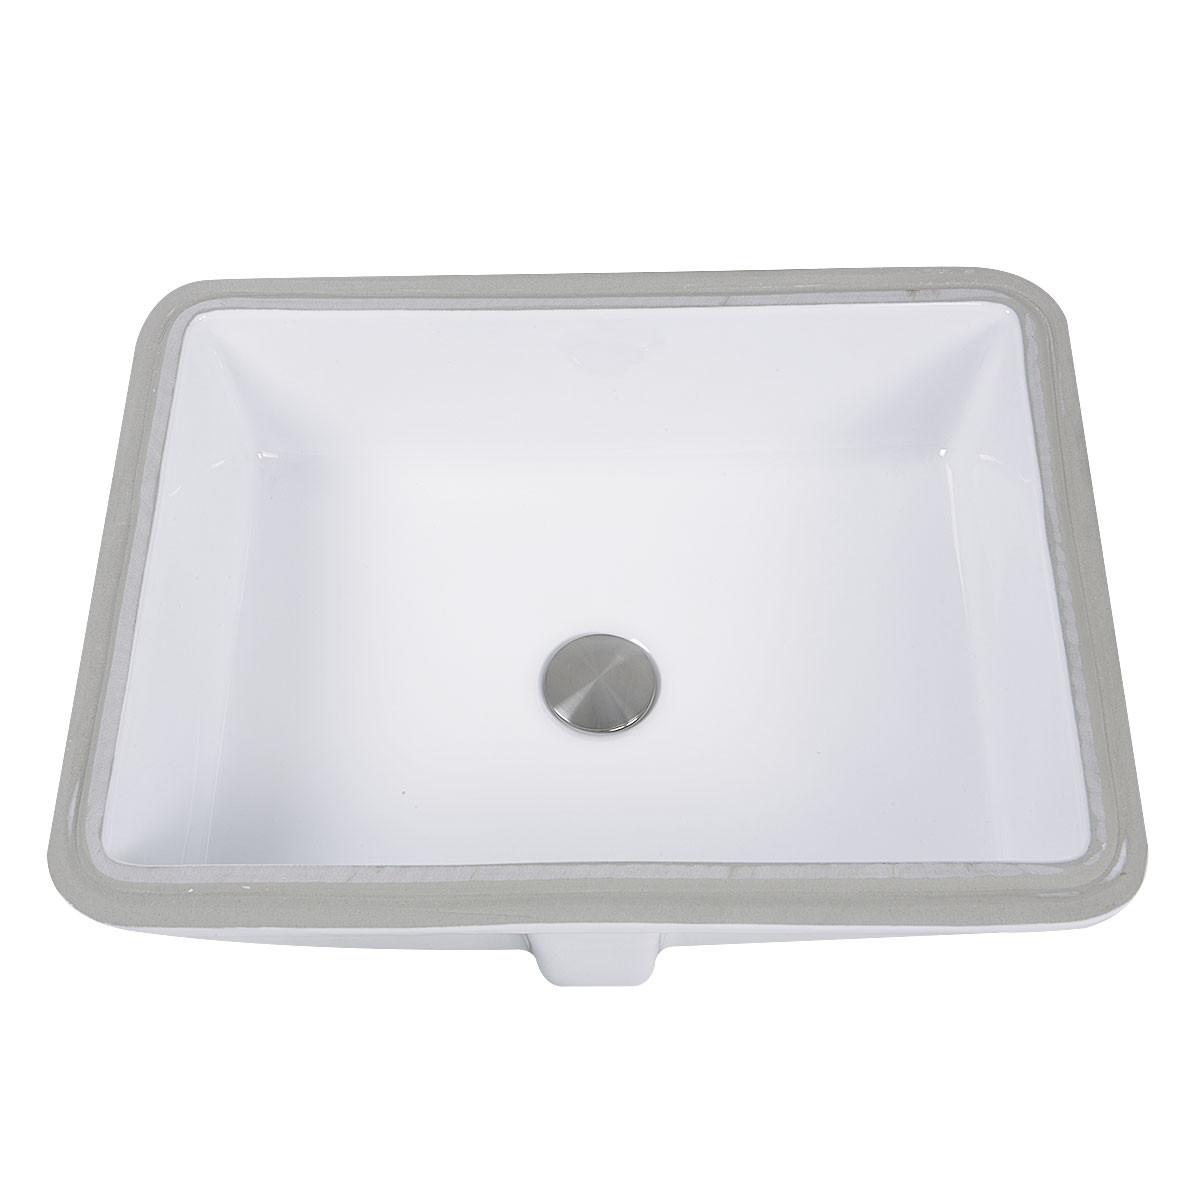 Nantucket Sinks GB-17x13-W Undermount Rectangle Ceramic Sink In White